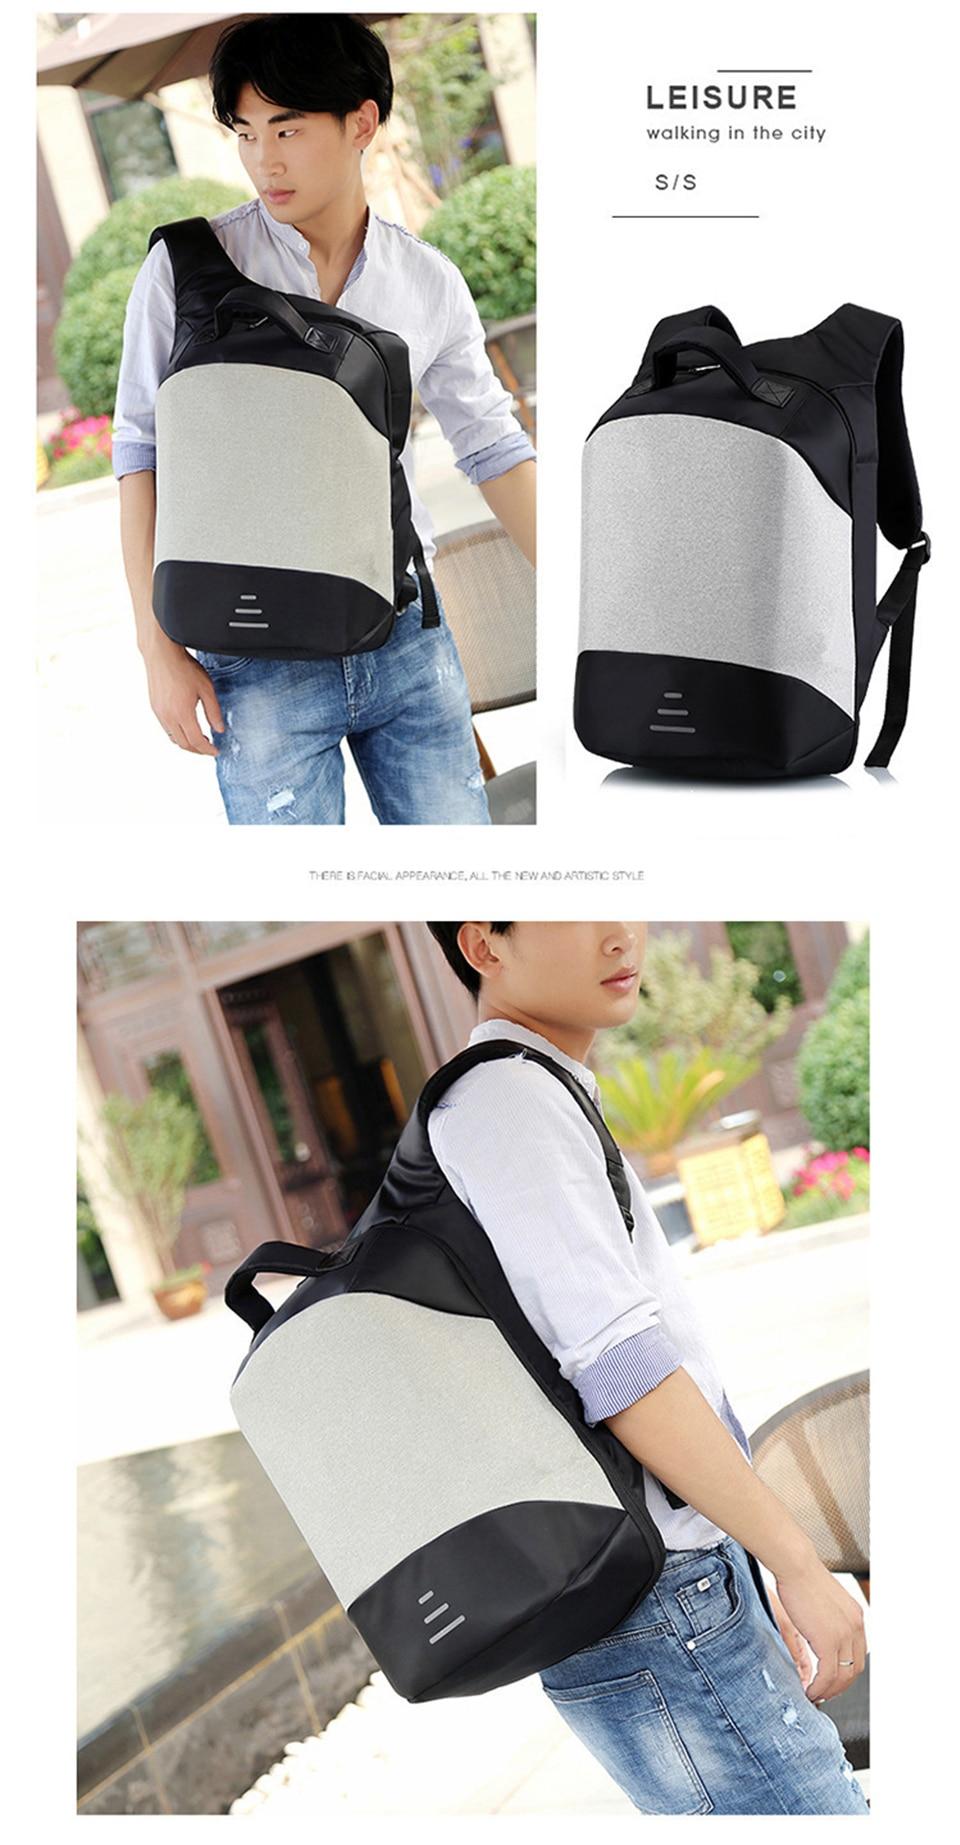 17''-Anti-theft-Backpack-Bag-Mens-Women-Male-Mochila-Outdoor-Travel-Bags-15.6-Inch-Laptop-Backpacks-USB-Charging-Backpacking-Men_13